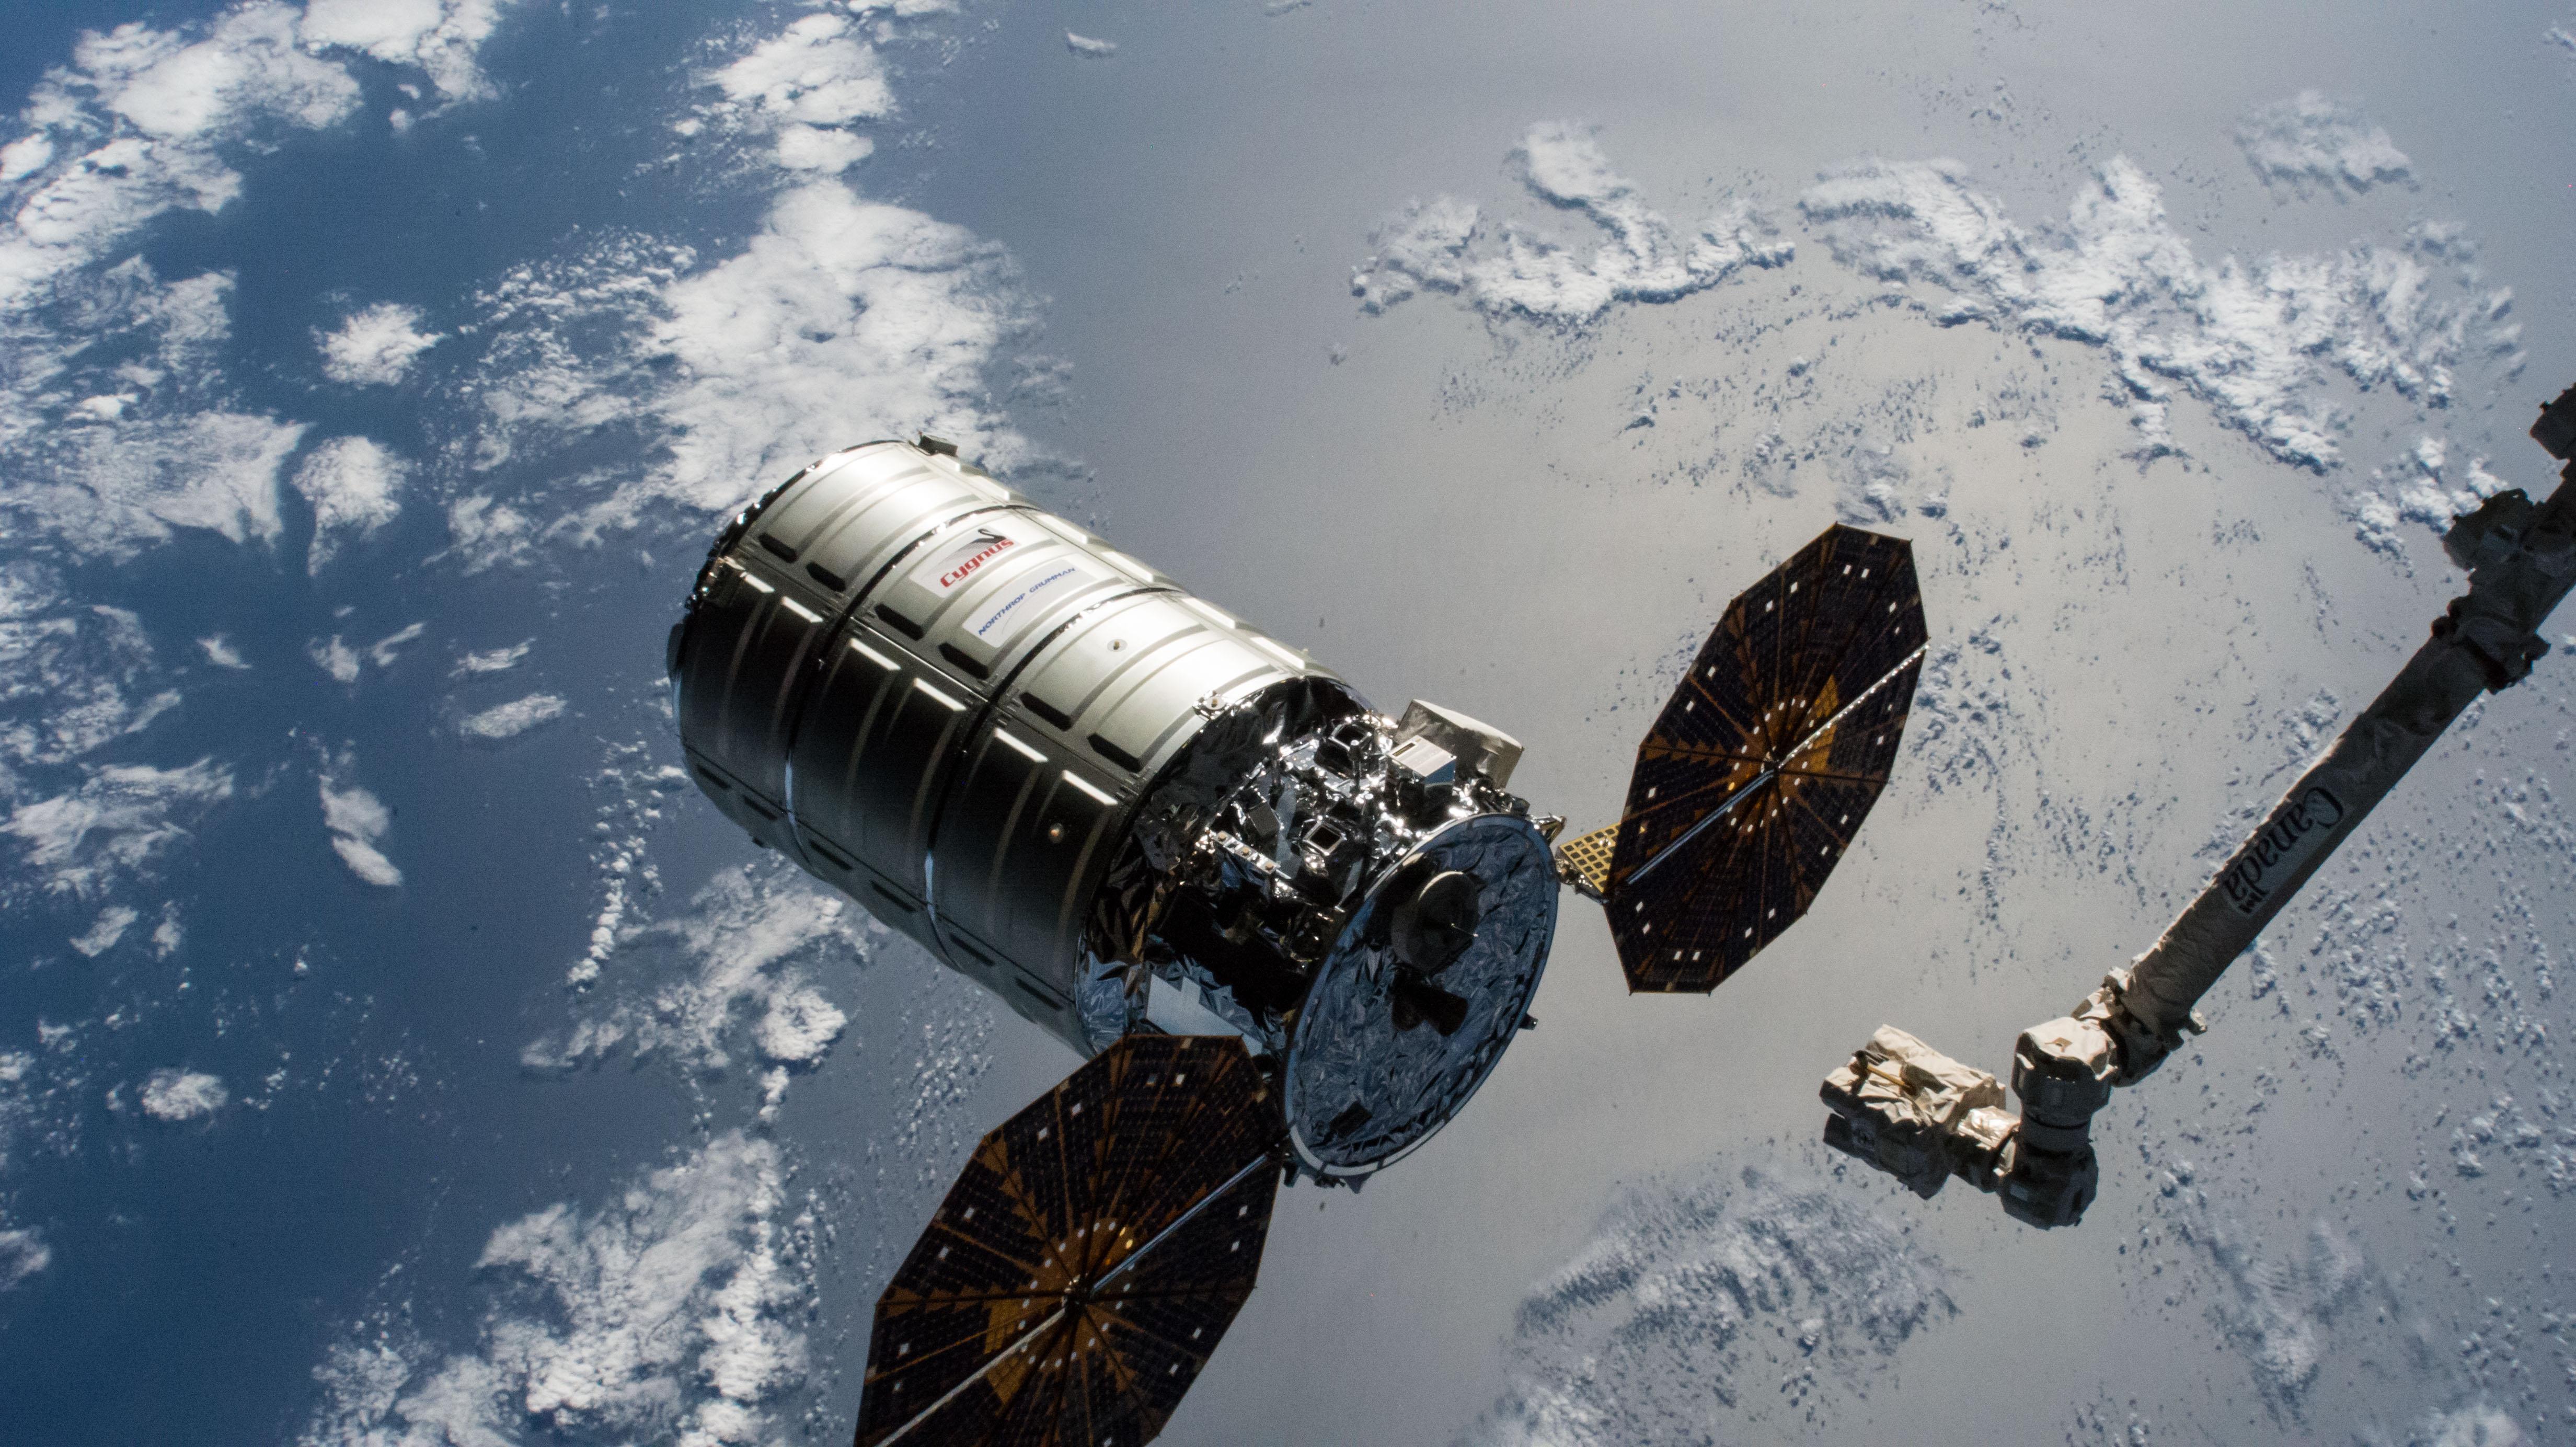 The Cygnus cargo craft from Northrop Grumman | NASA